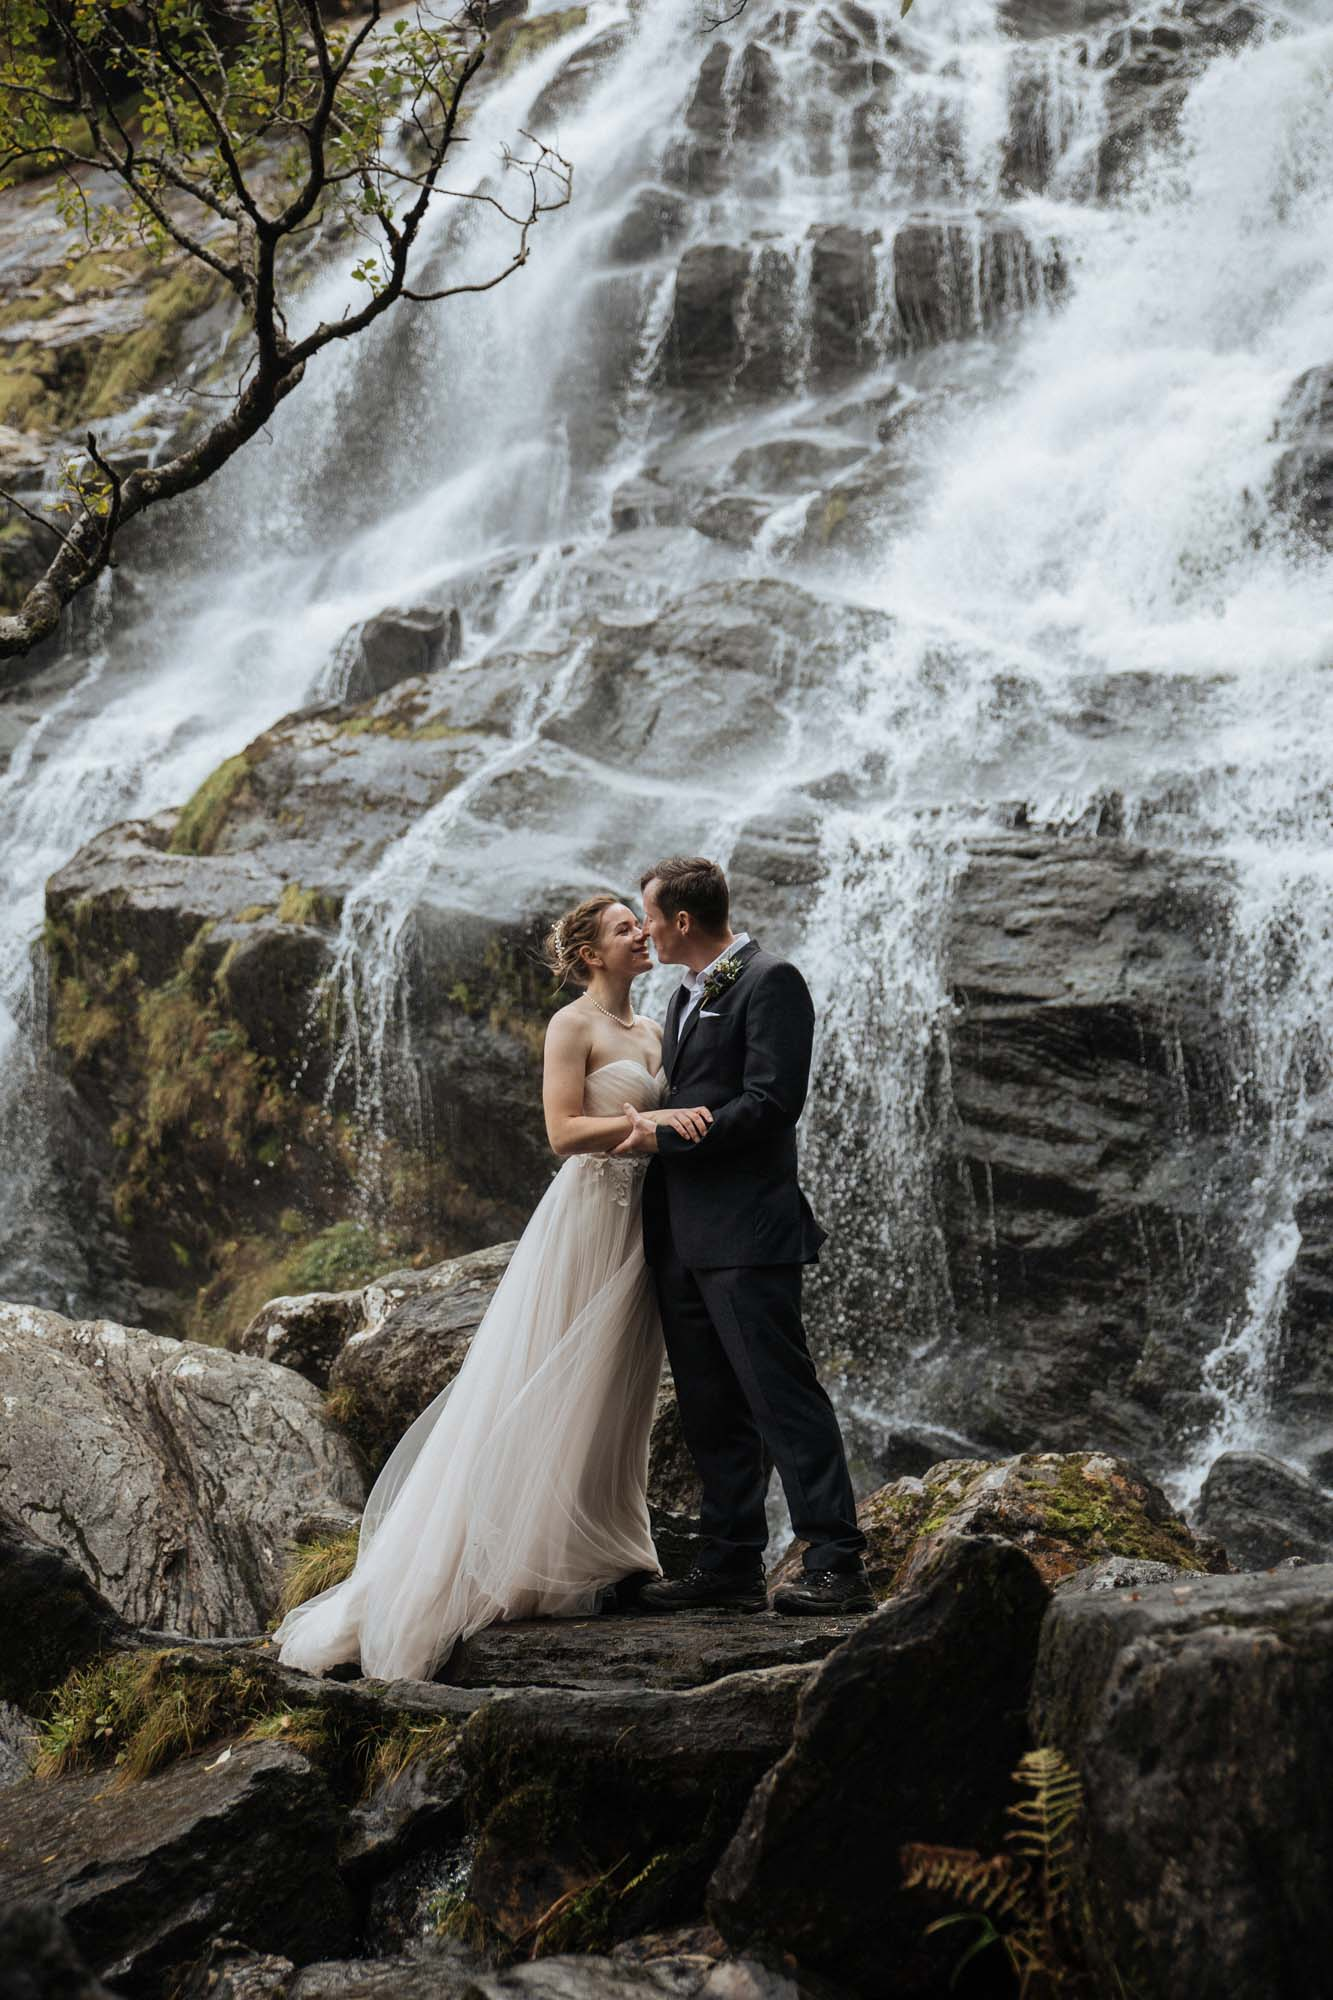 Waterfall Elopement in Scotland